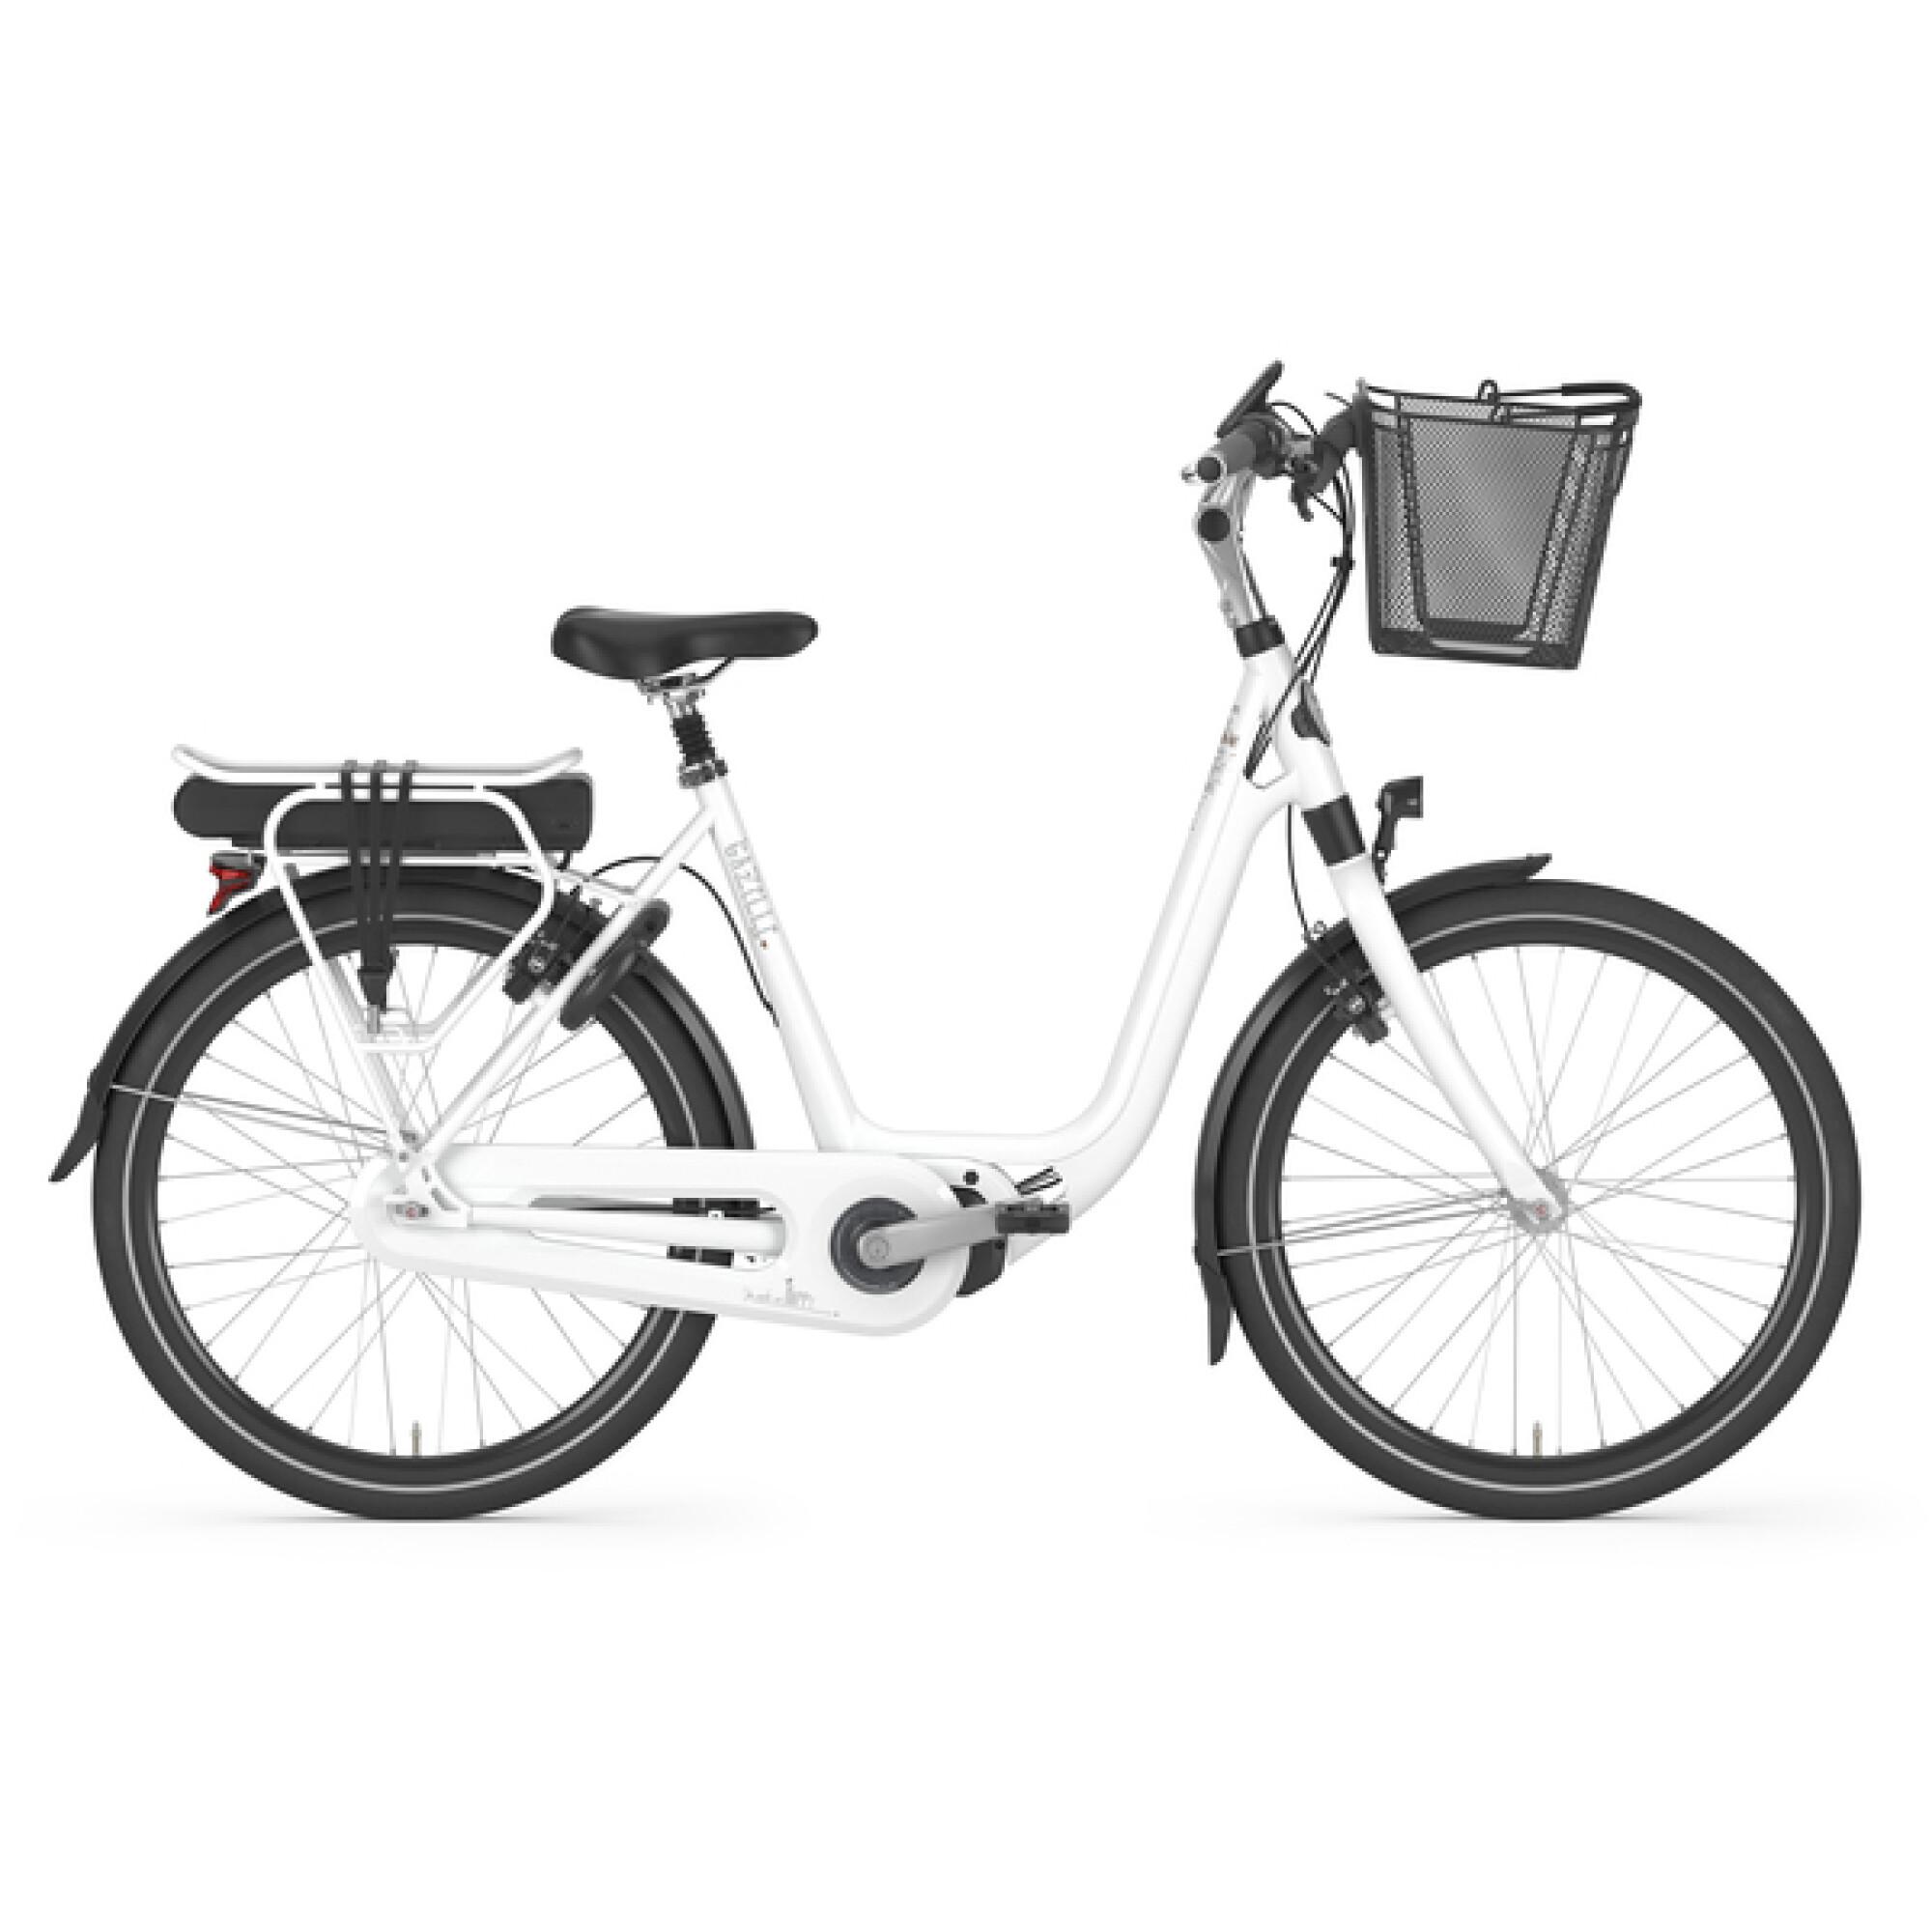 e bike gazelle ami c8 hms 2018 bei alle. Black Bedroom Furniture Sets. Home Design Ideas